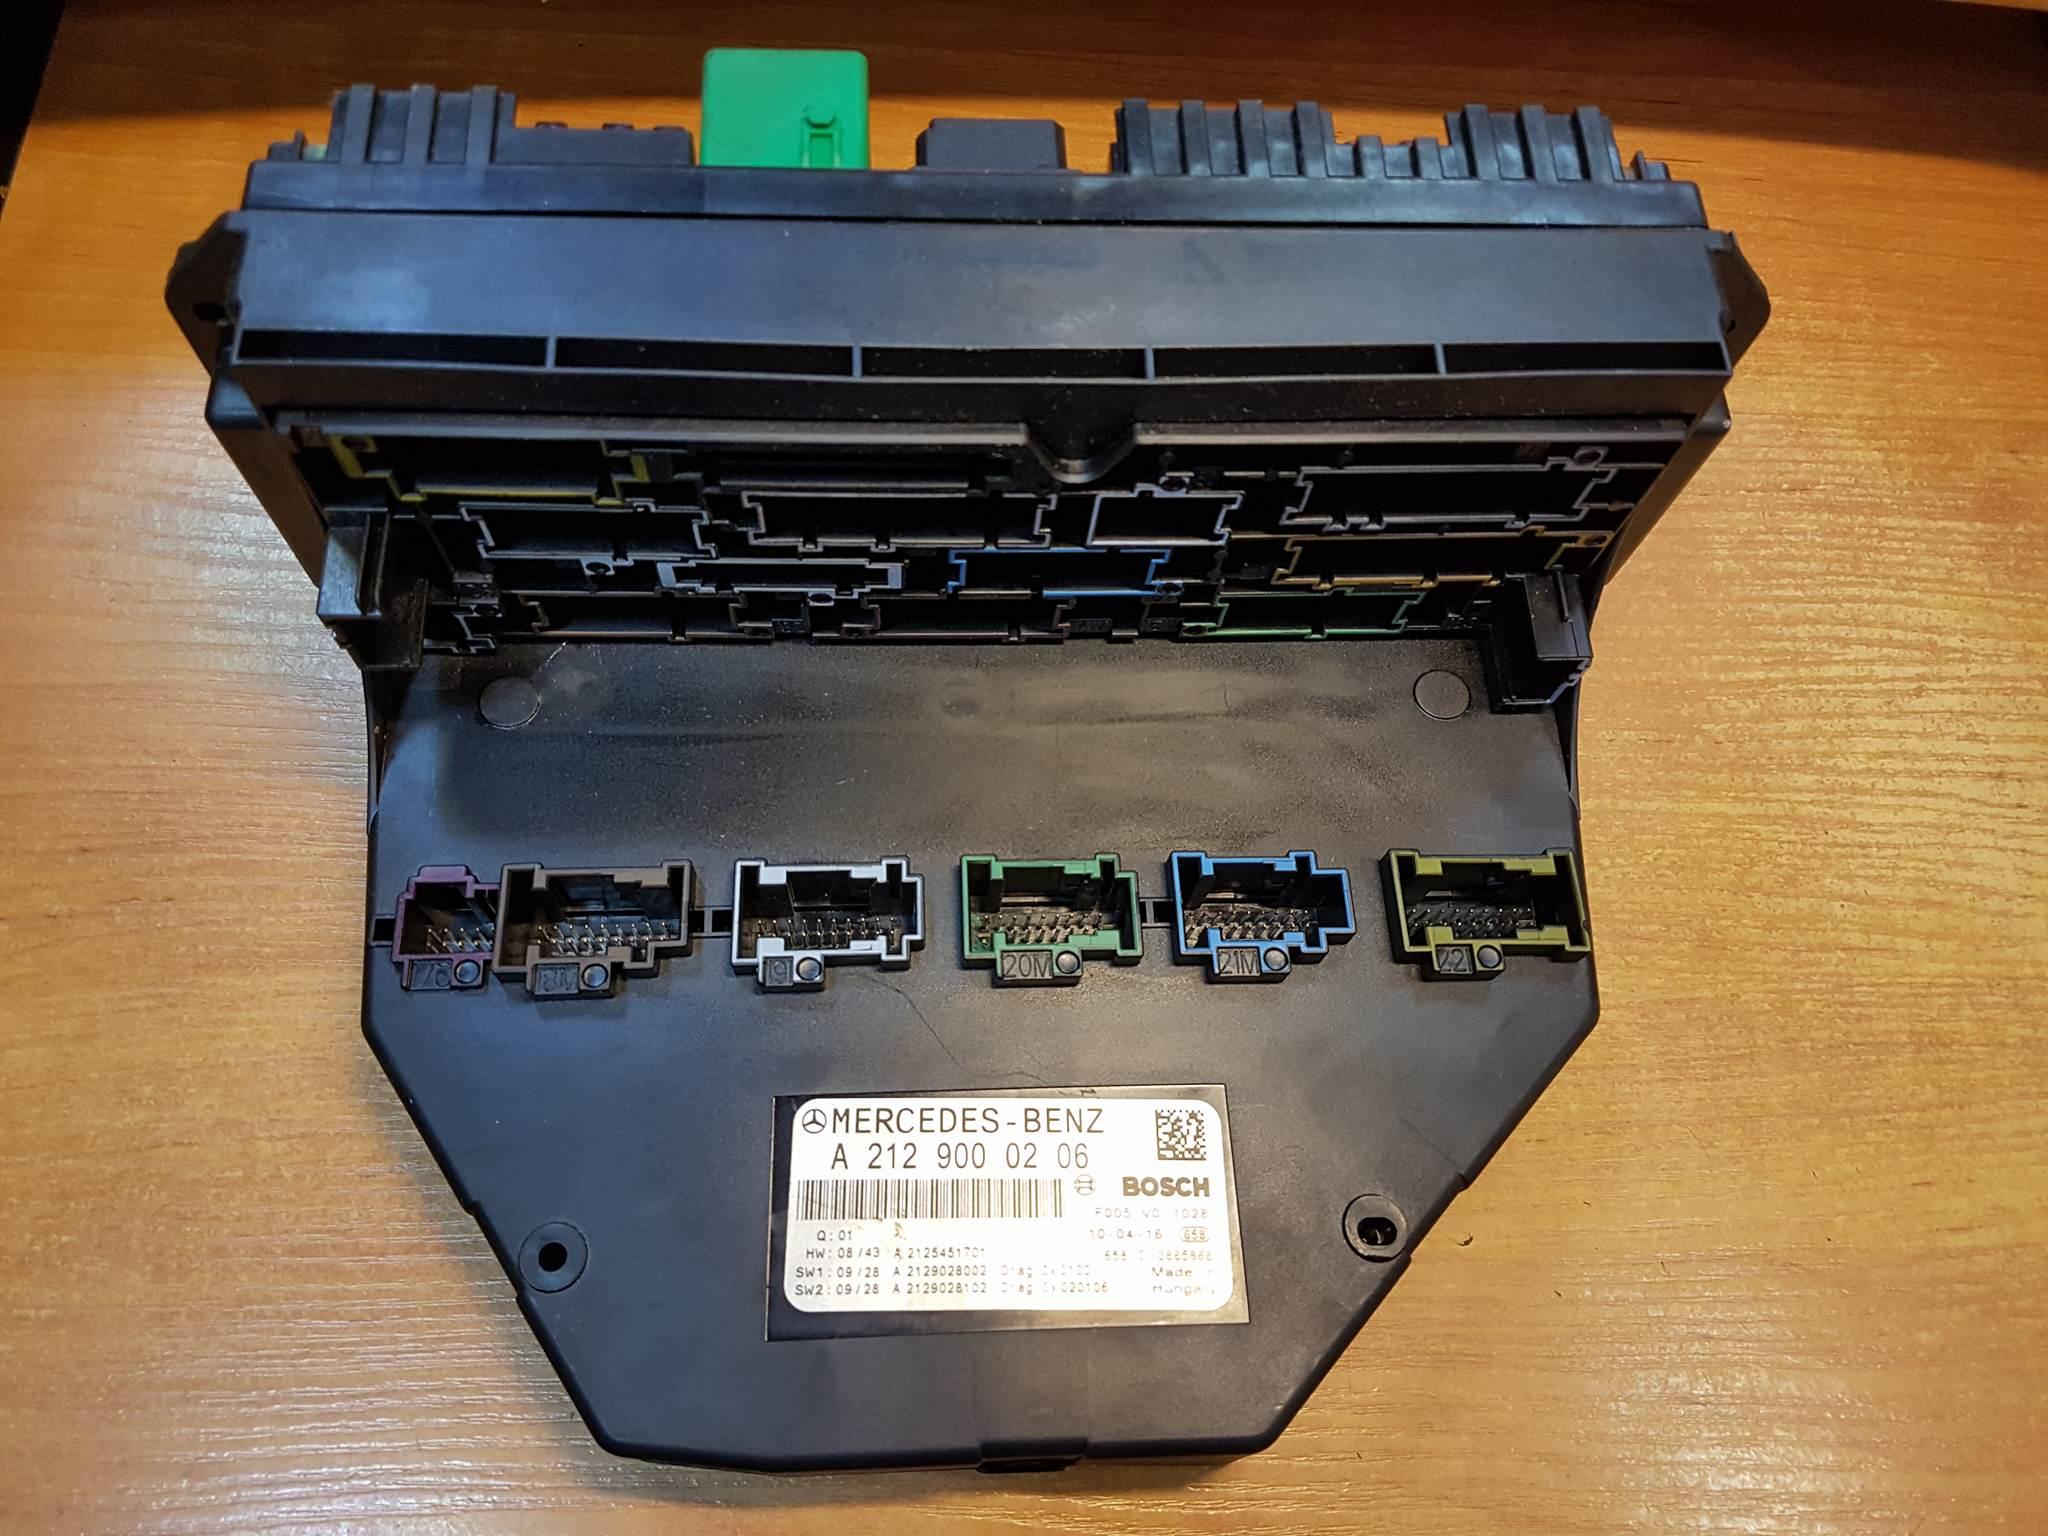 Mercedes E Class W212 Front Sam Fuse Relay Control Box Unit Sw2 A2129000206 Article